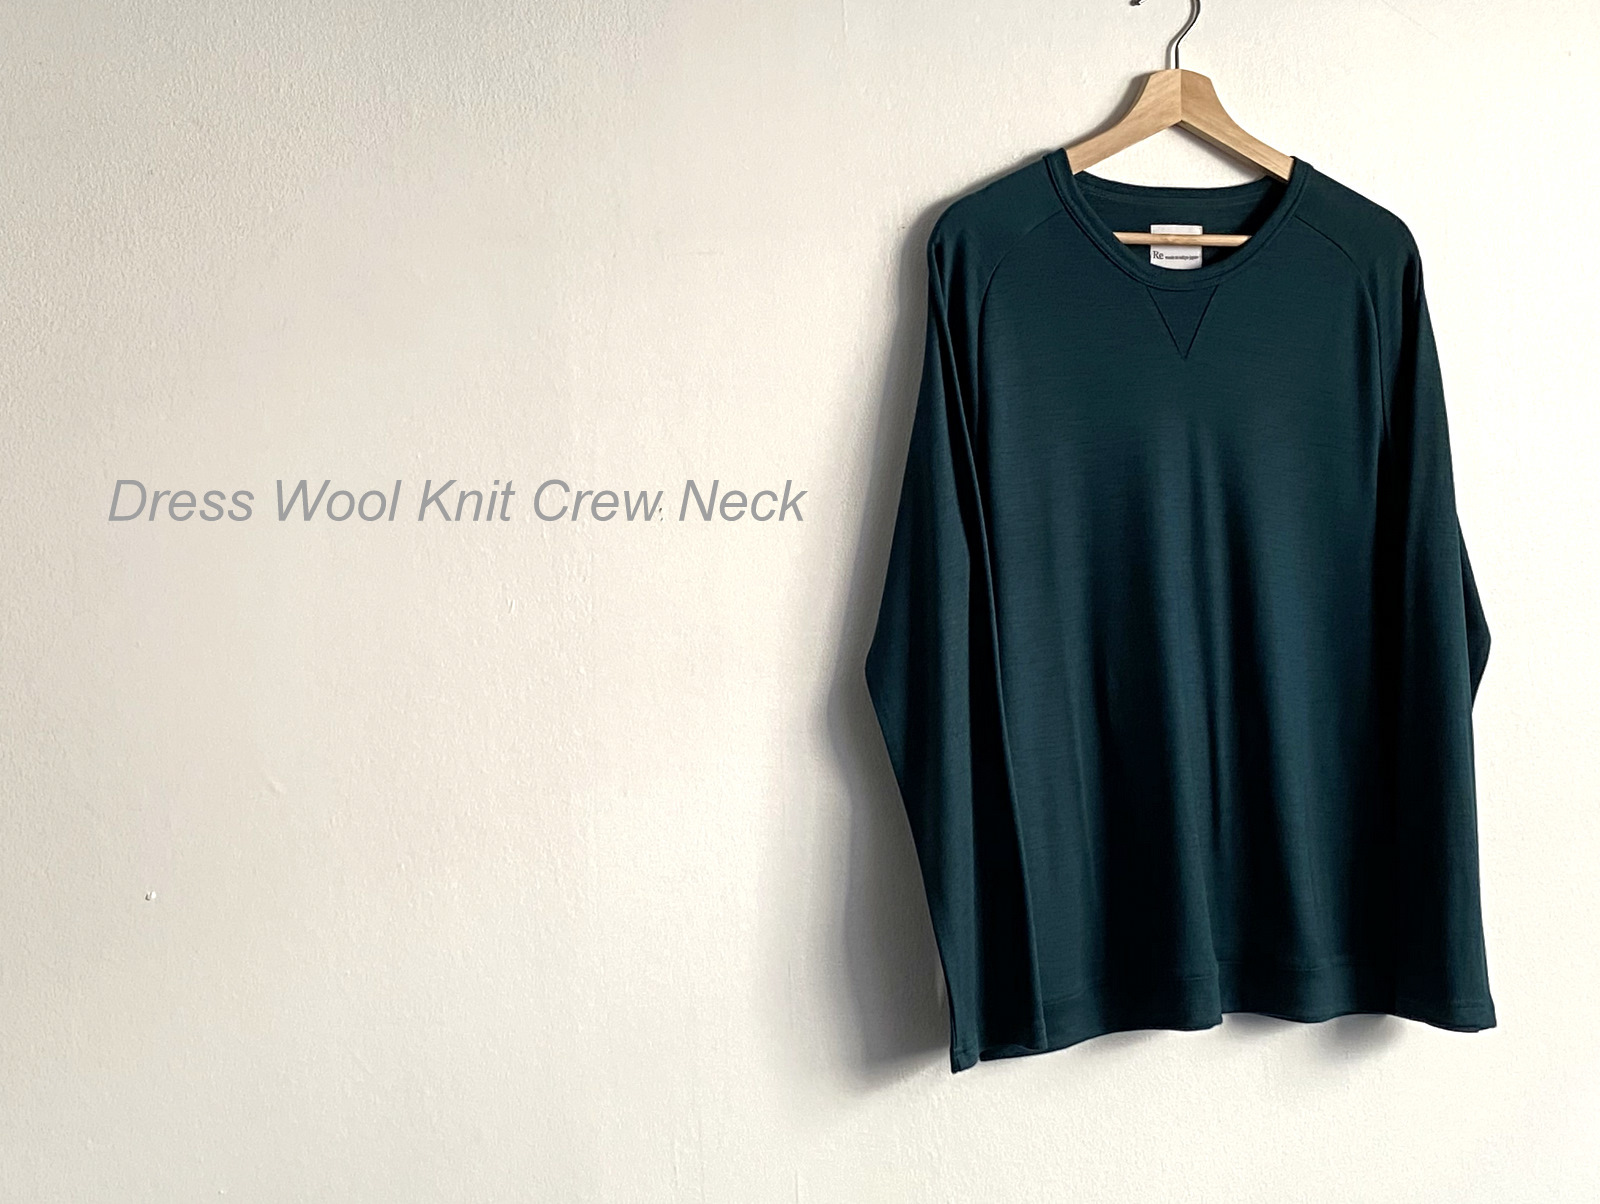 Dress Wool Knit Crew Neck_c0379477_19230851.jpg